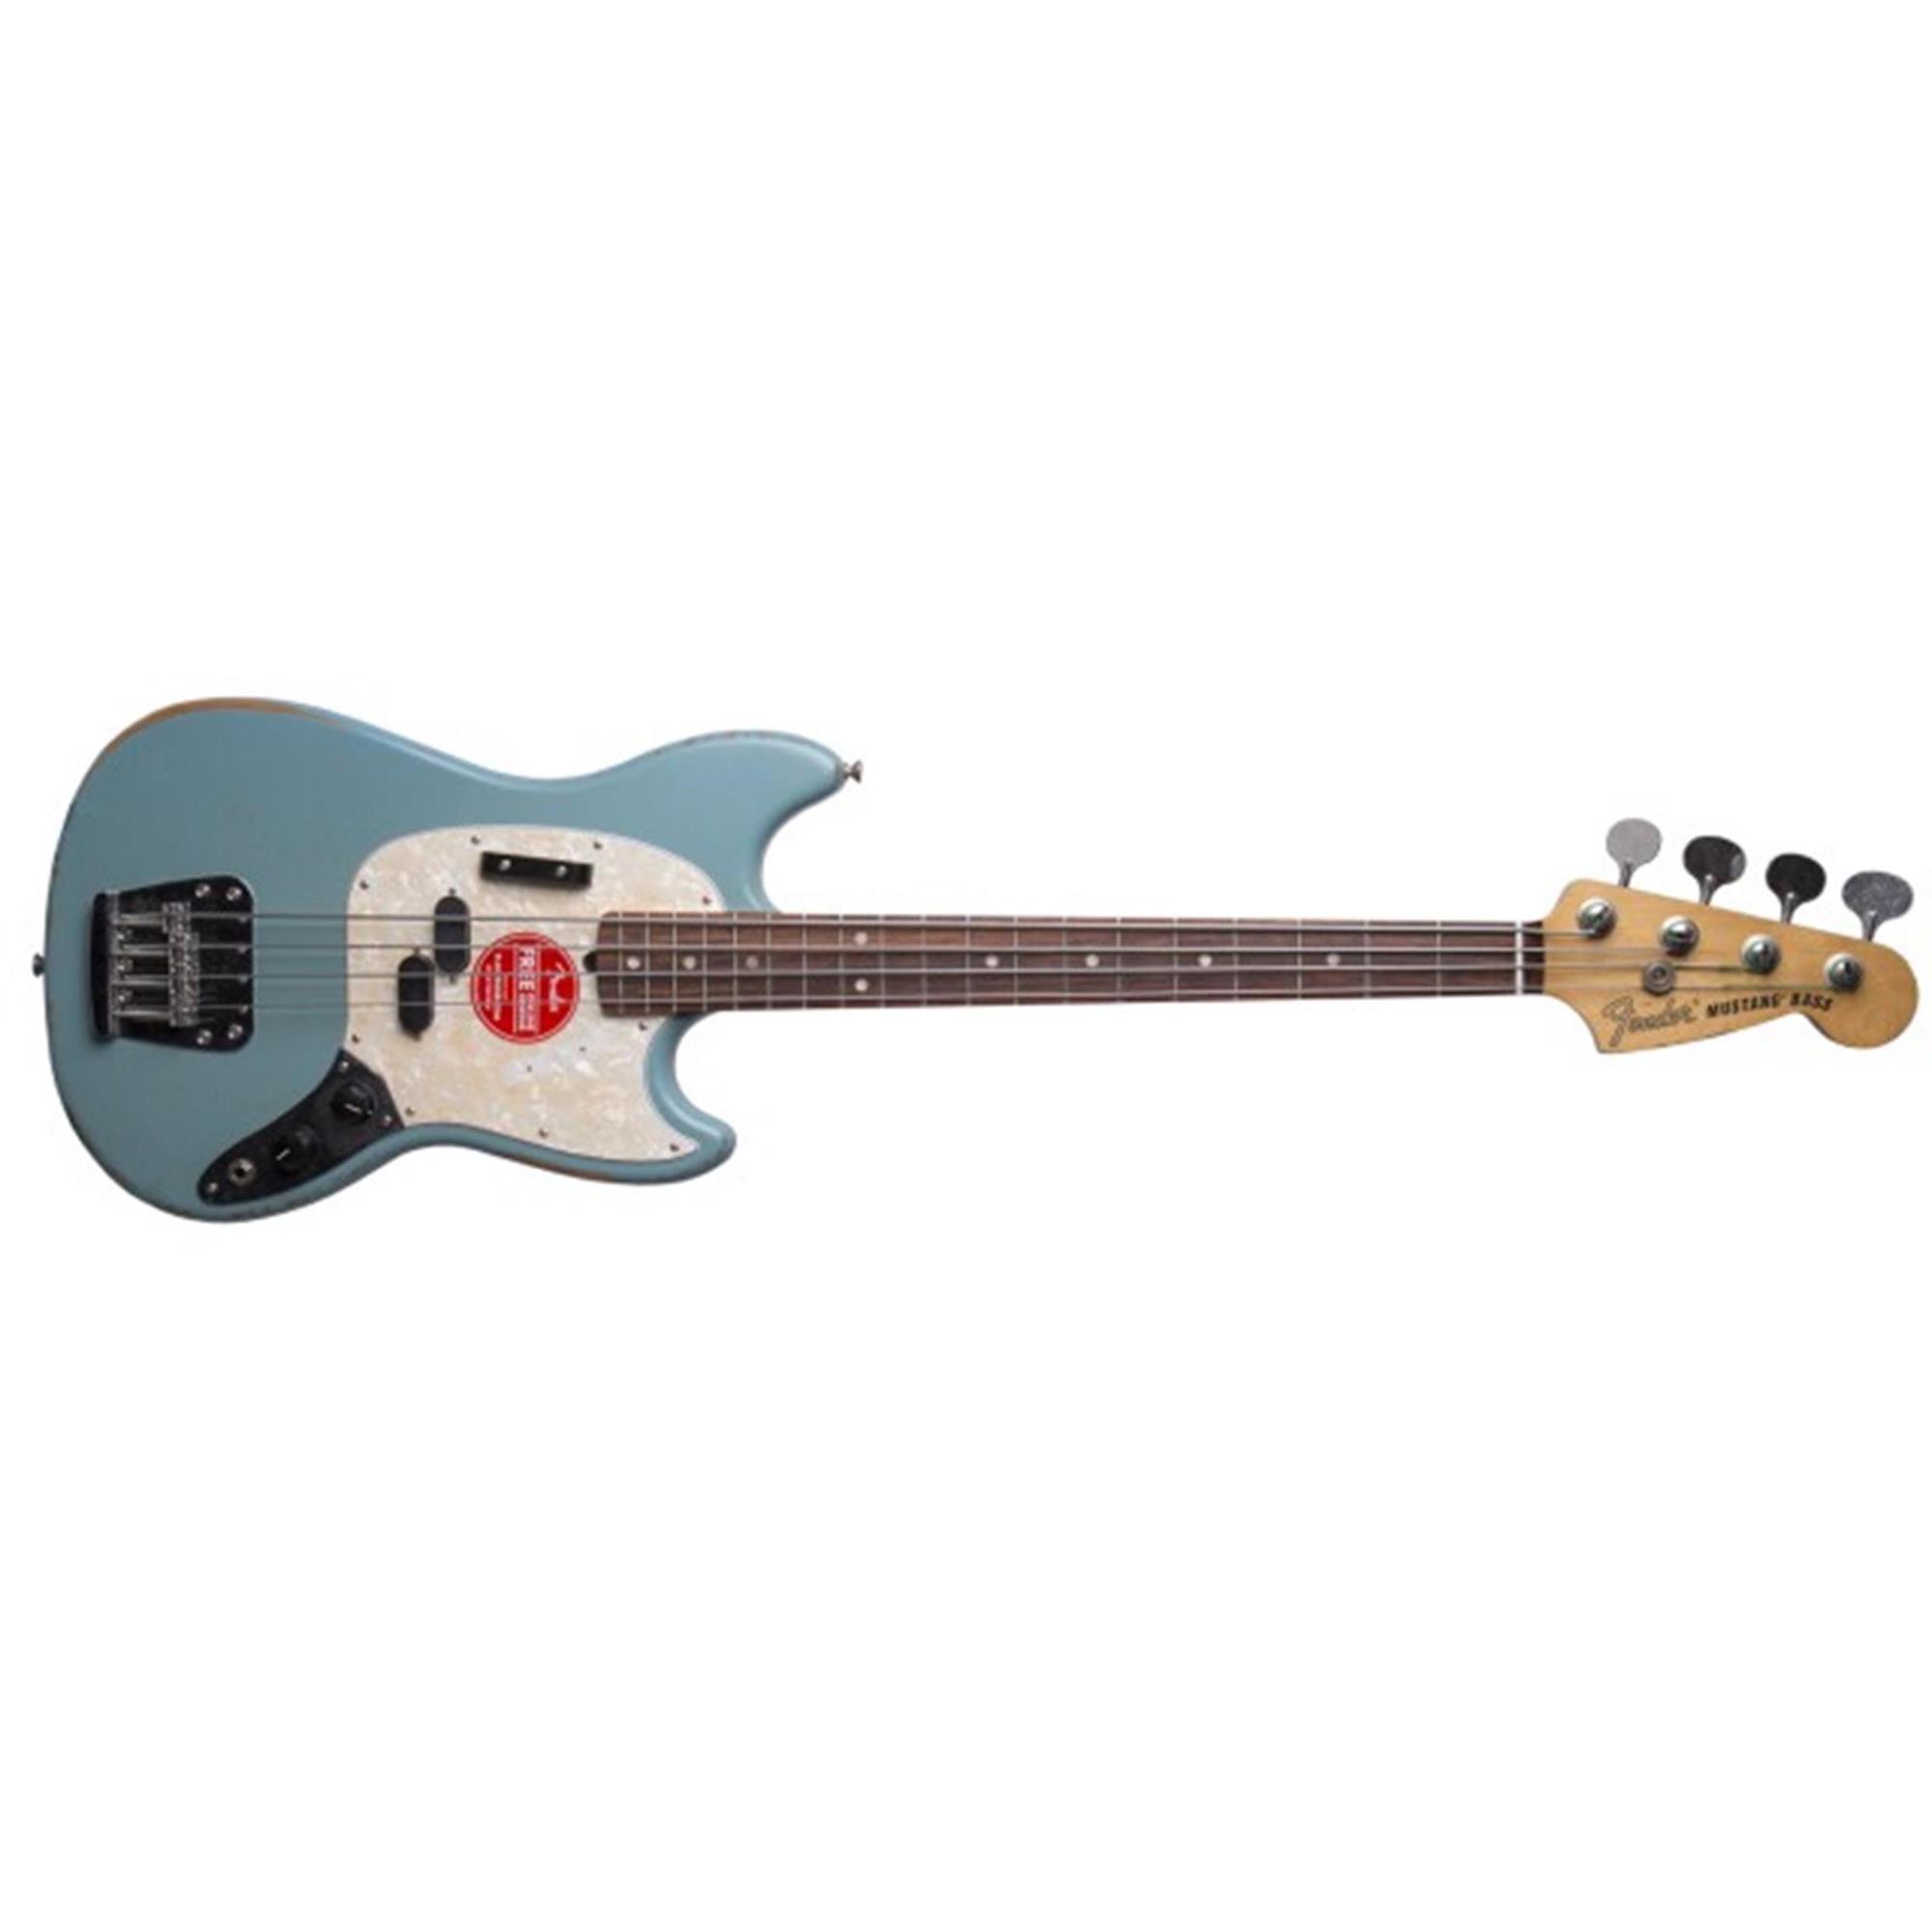 FENDER-JMJ-Road-Worn-Mustang-Bass-RW-Faded-Daphne-Blue-Justin-Meldal-Johnsen-s-0144060390-sku-21249